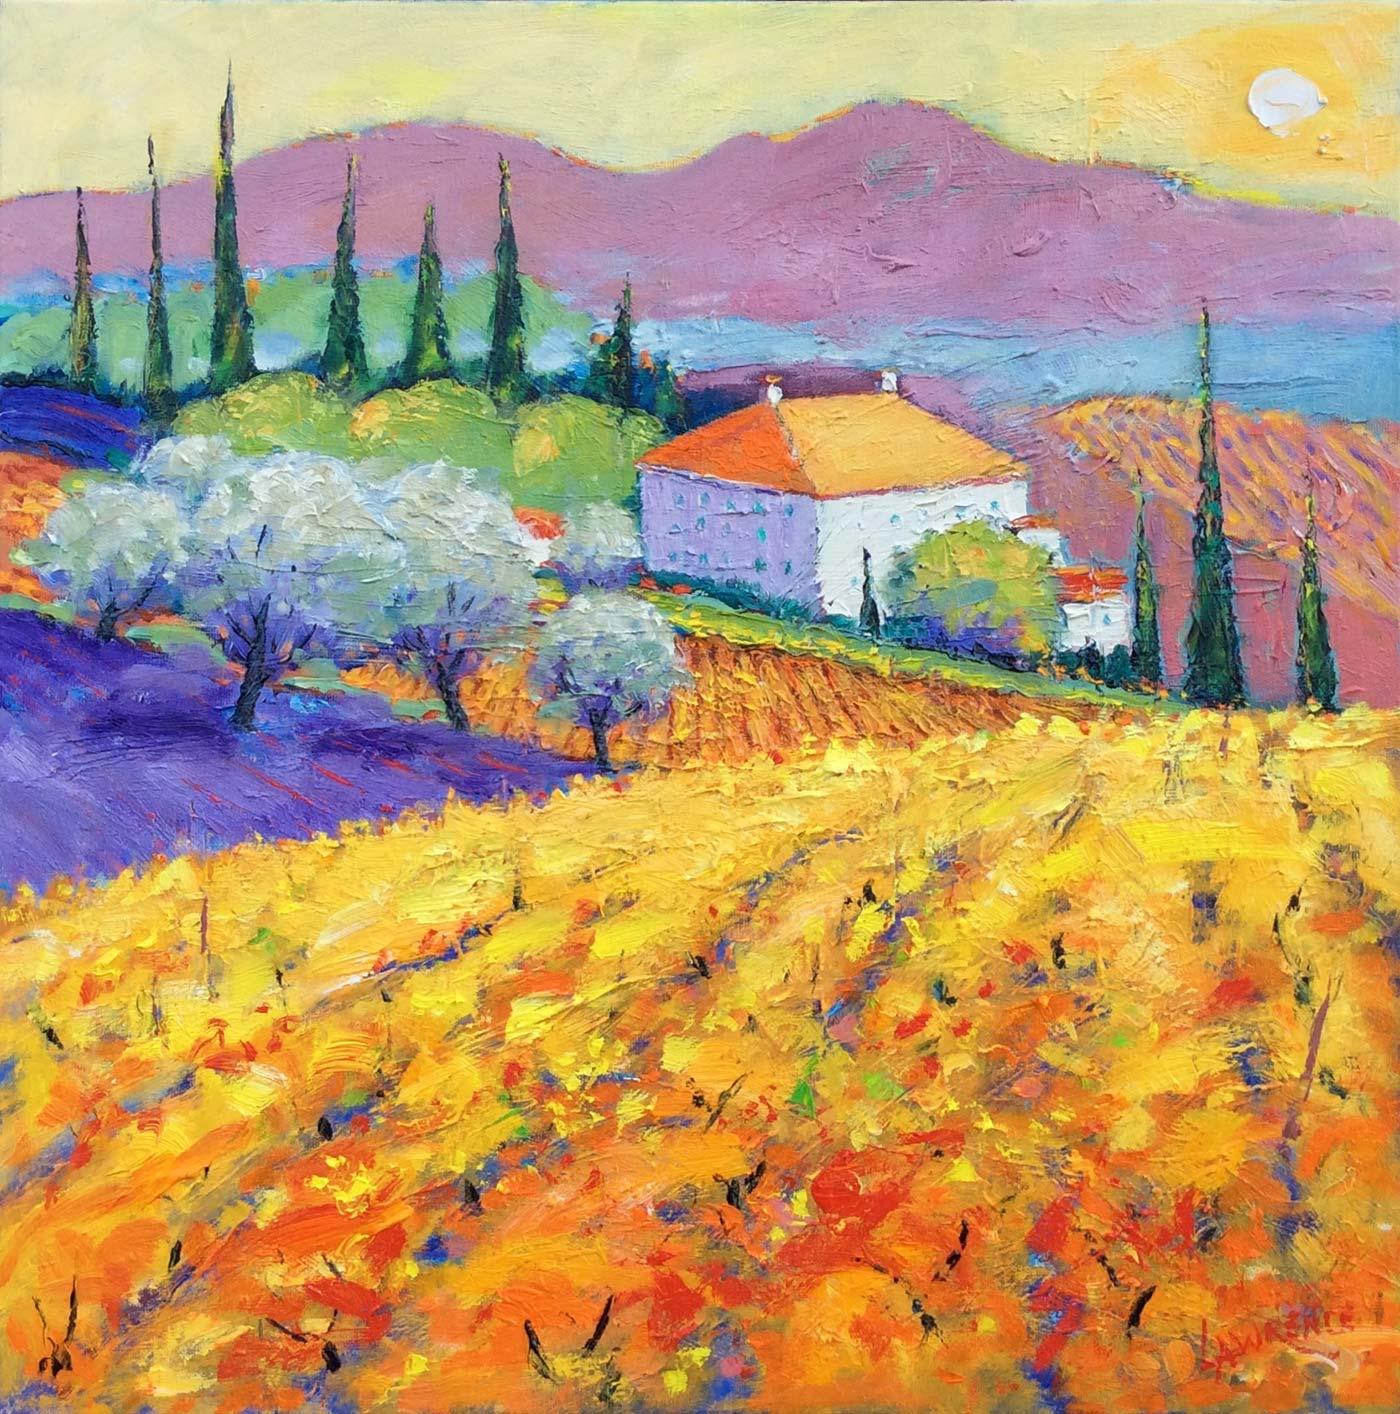 Farmhouse And Vines - Italy